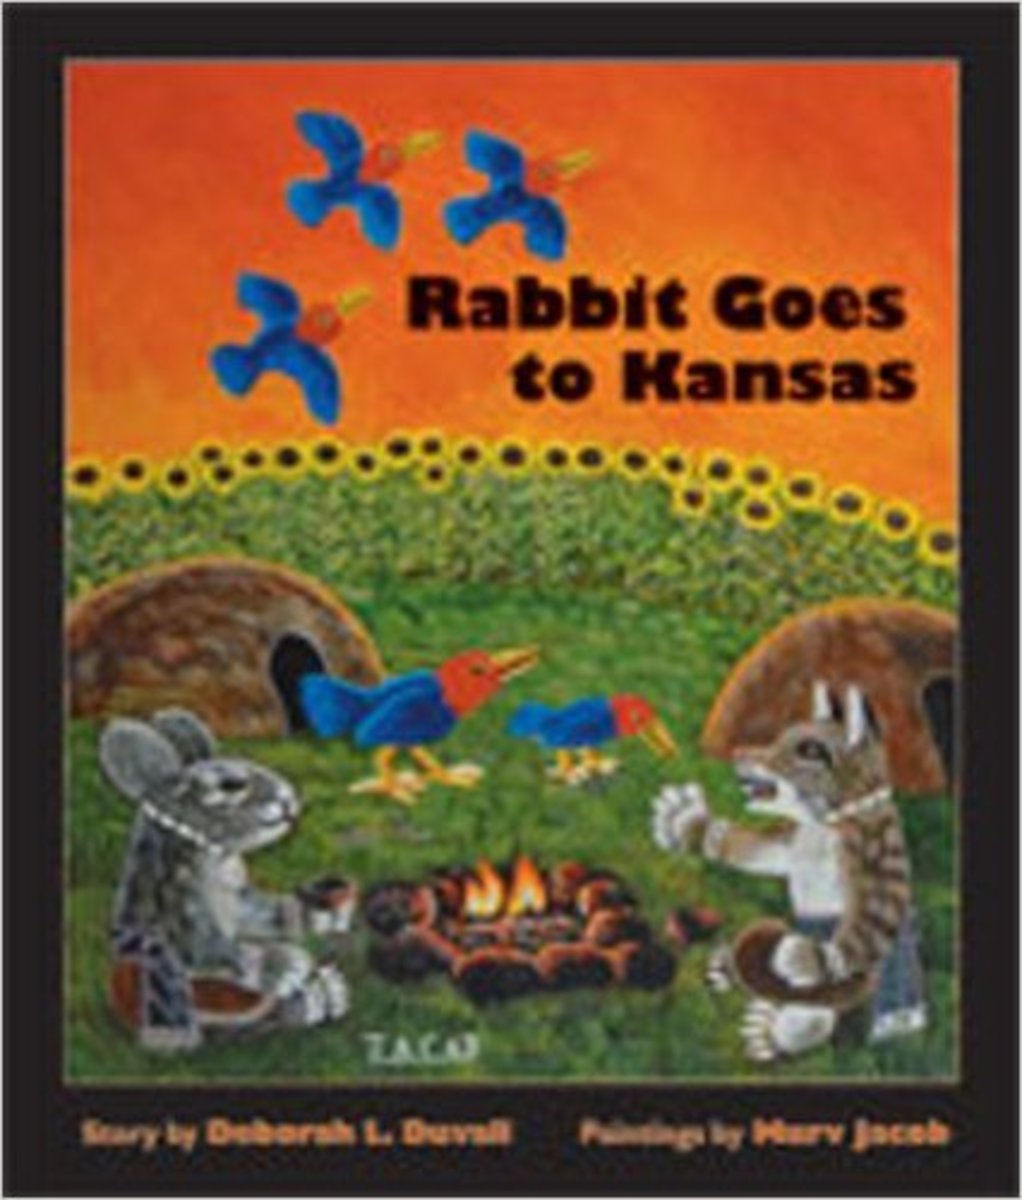 Rabbit Goes to Kansas by Deborah L. Duvall